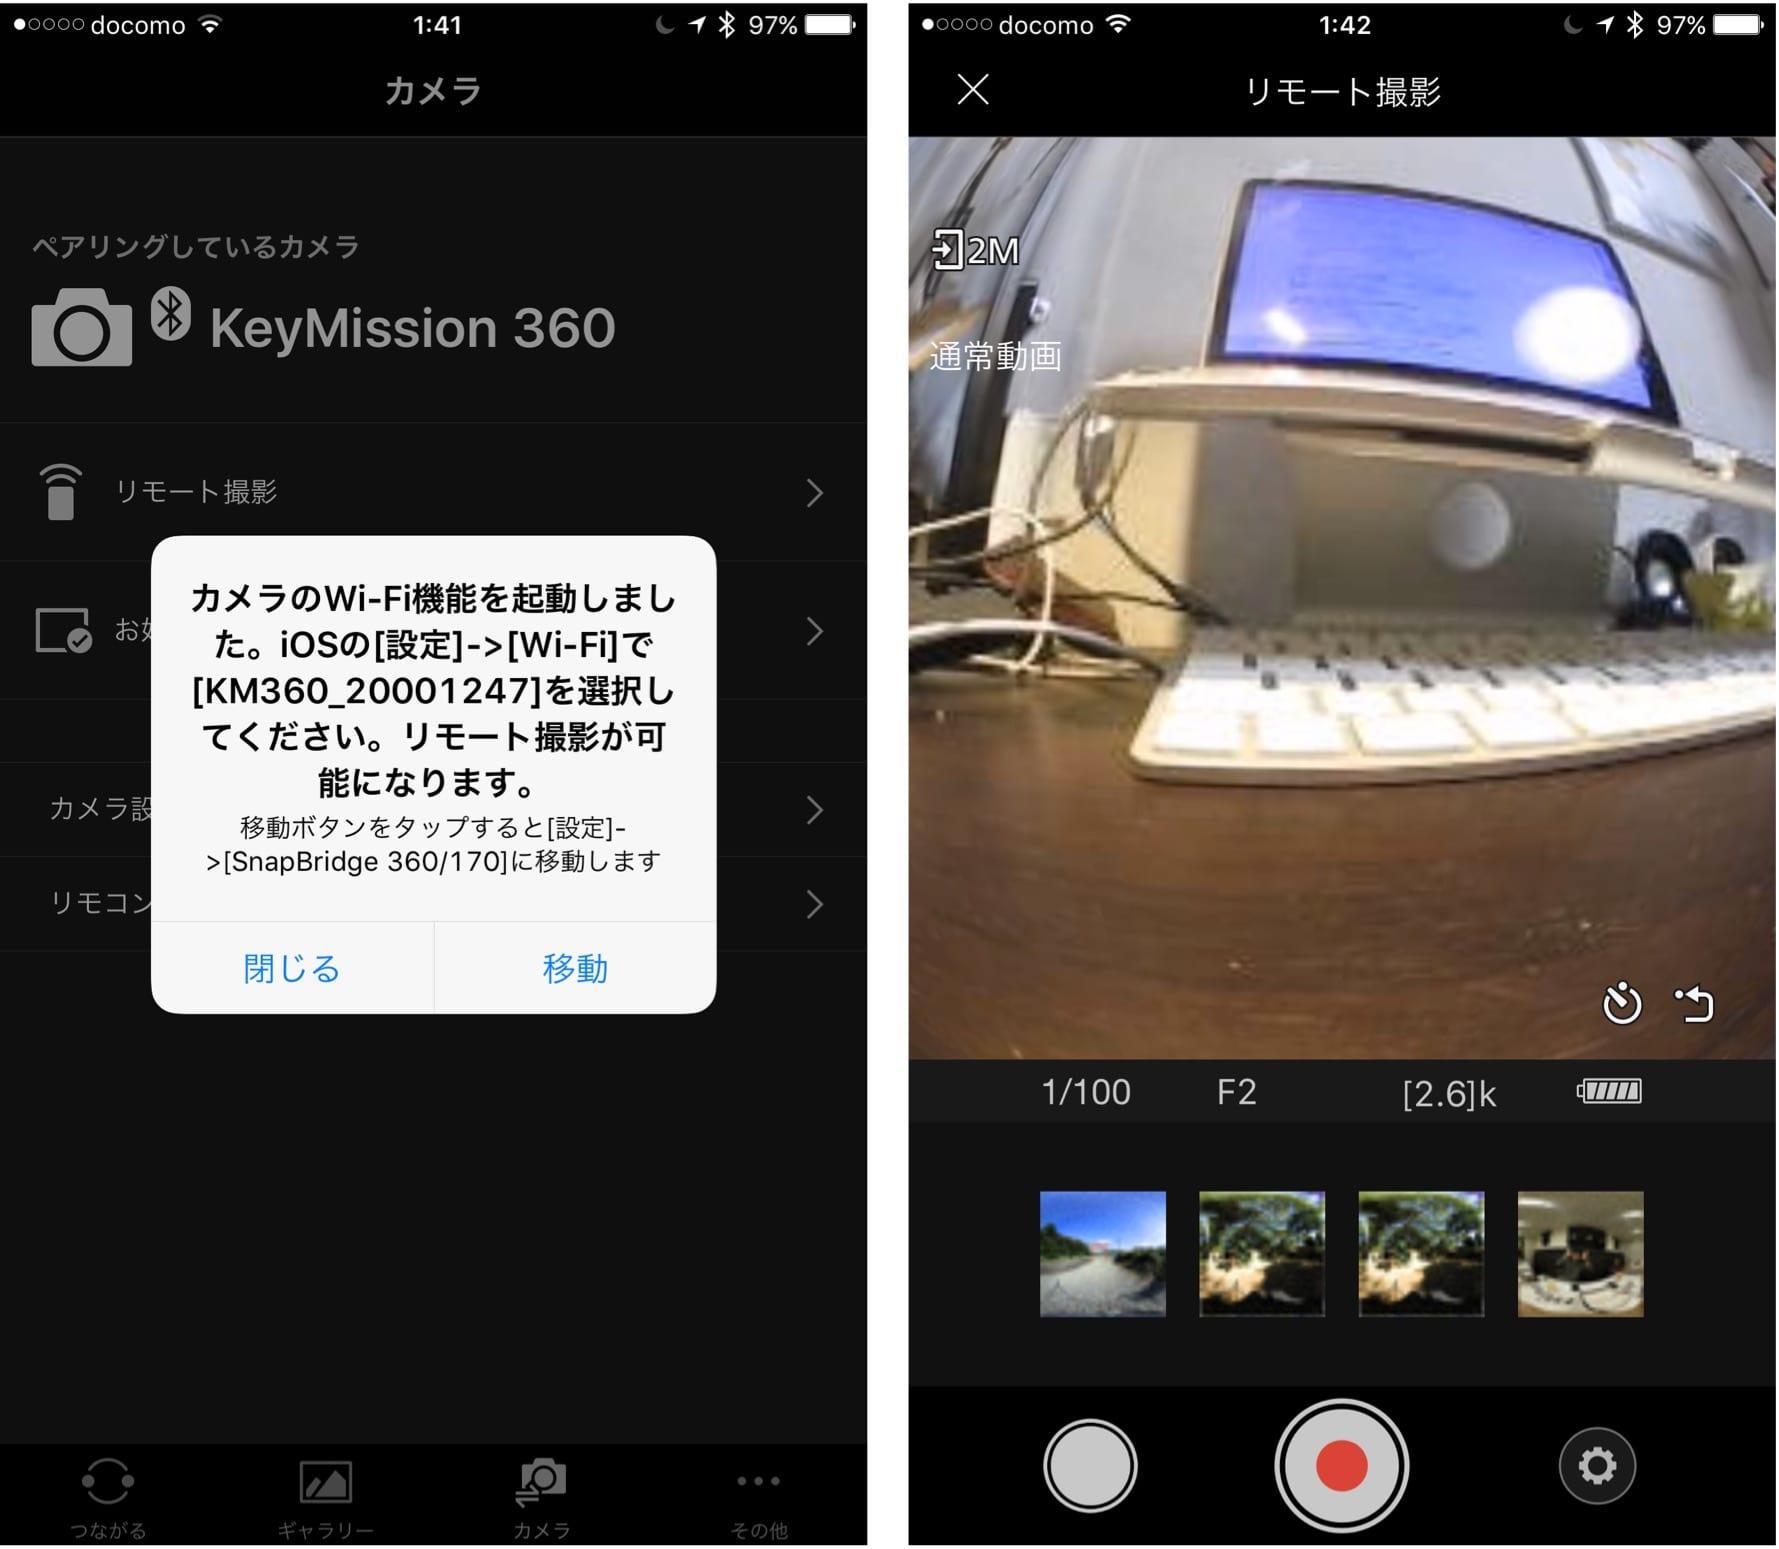 keymission-360-5.jpg